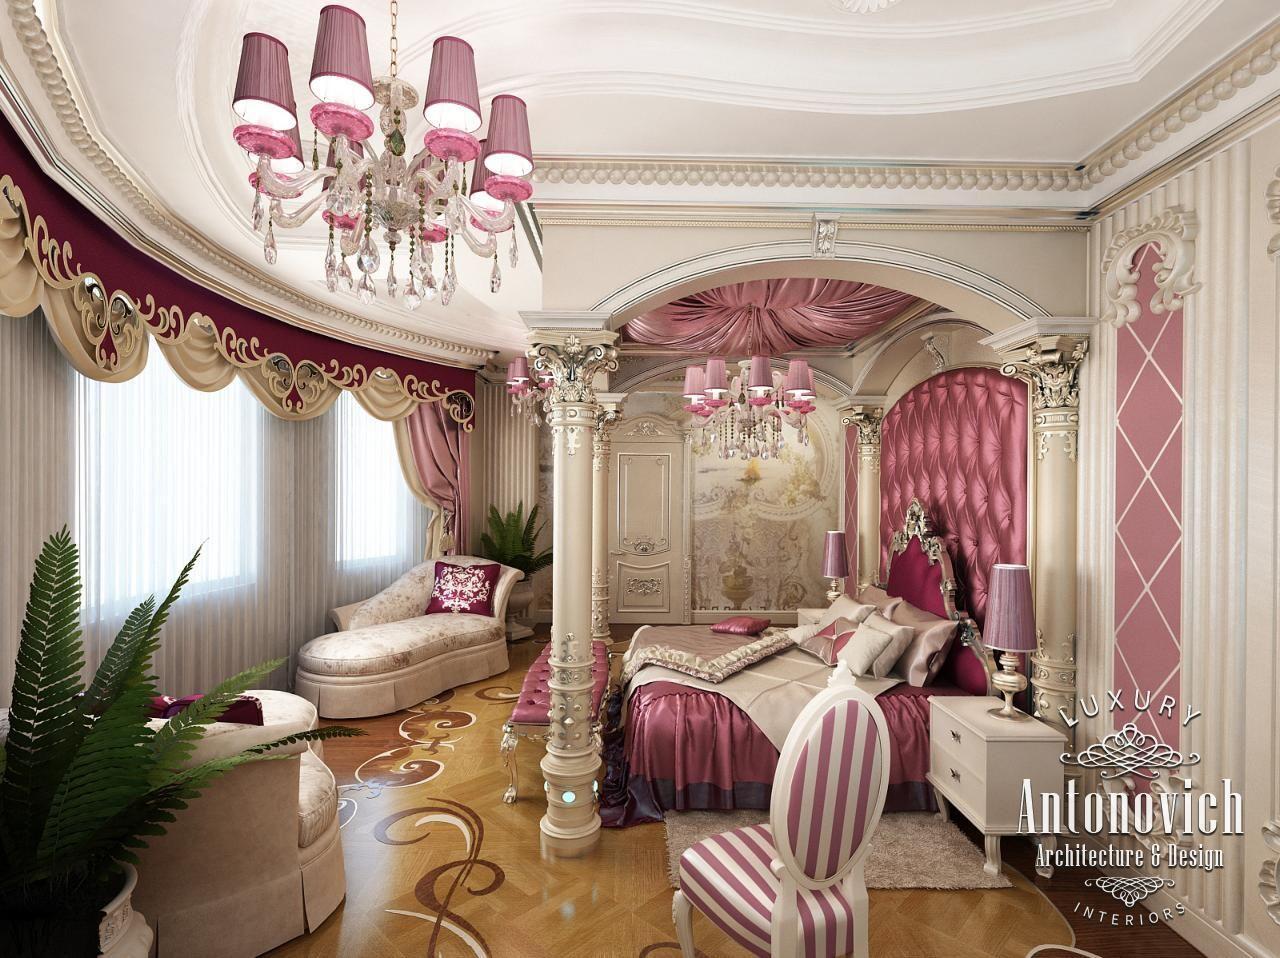 luxury antonovich design 10 girly home decor and on home interior design bedroom id=17551